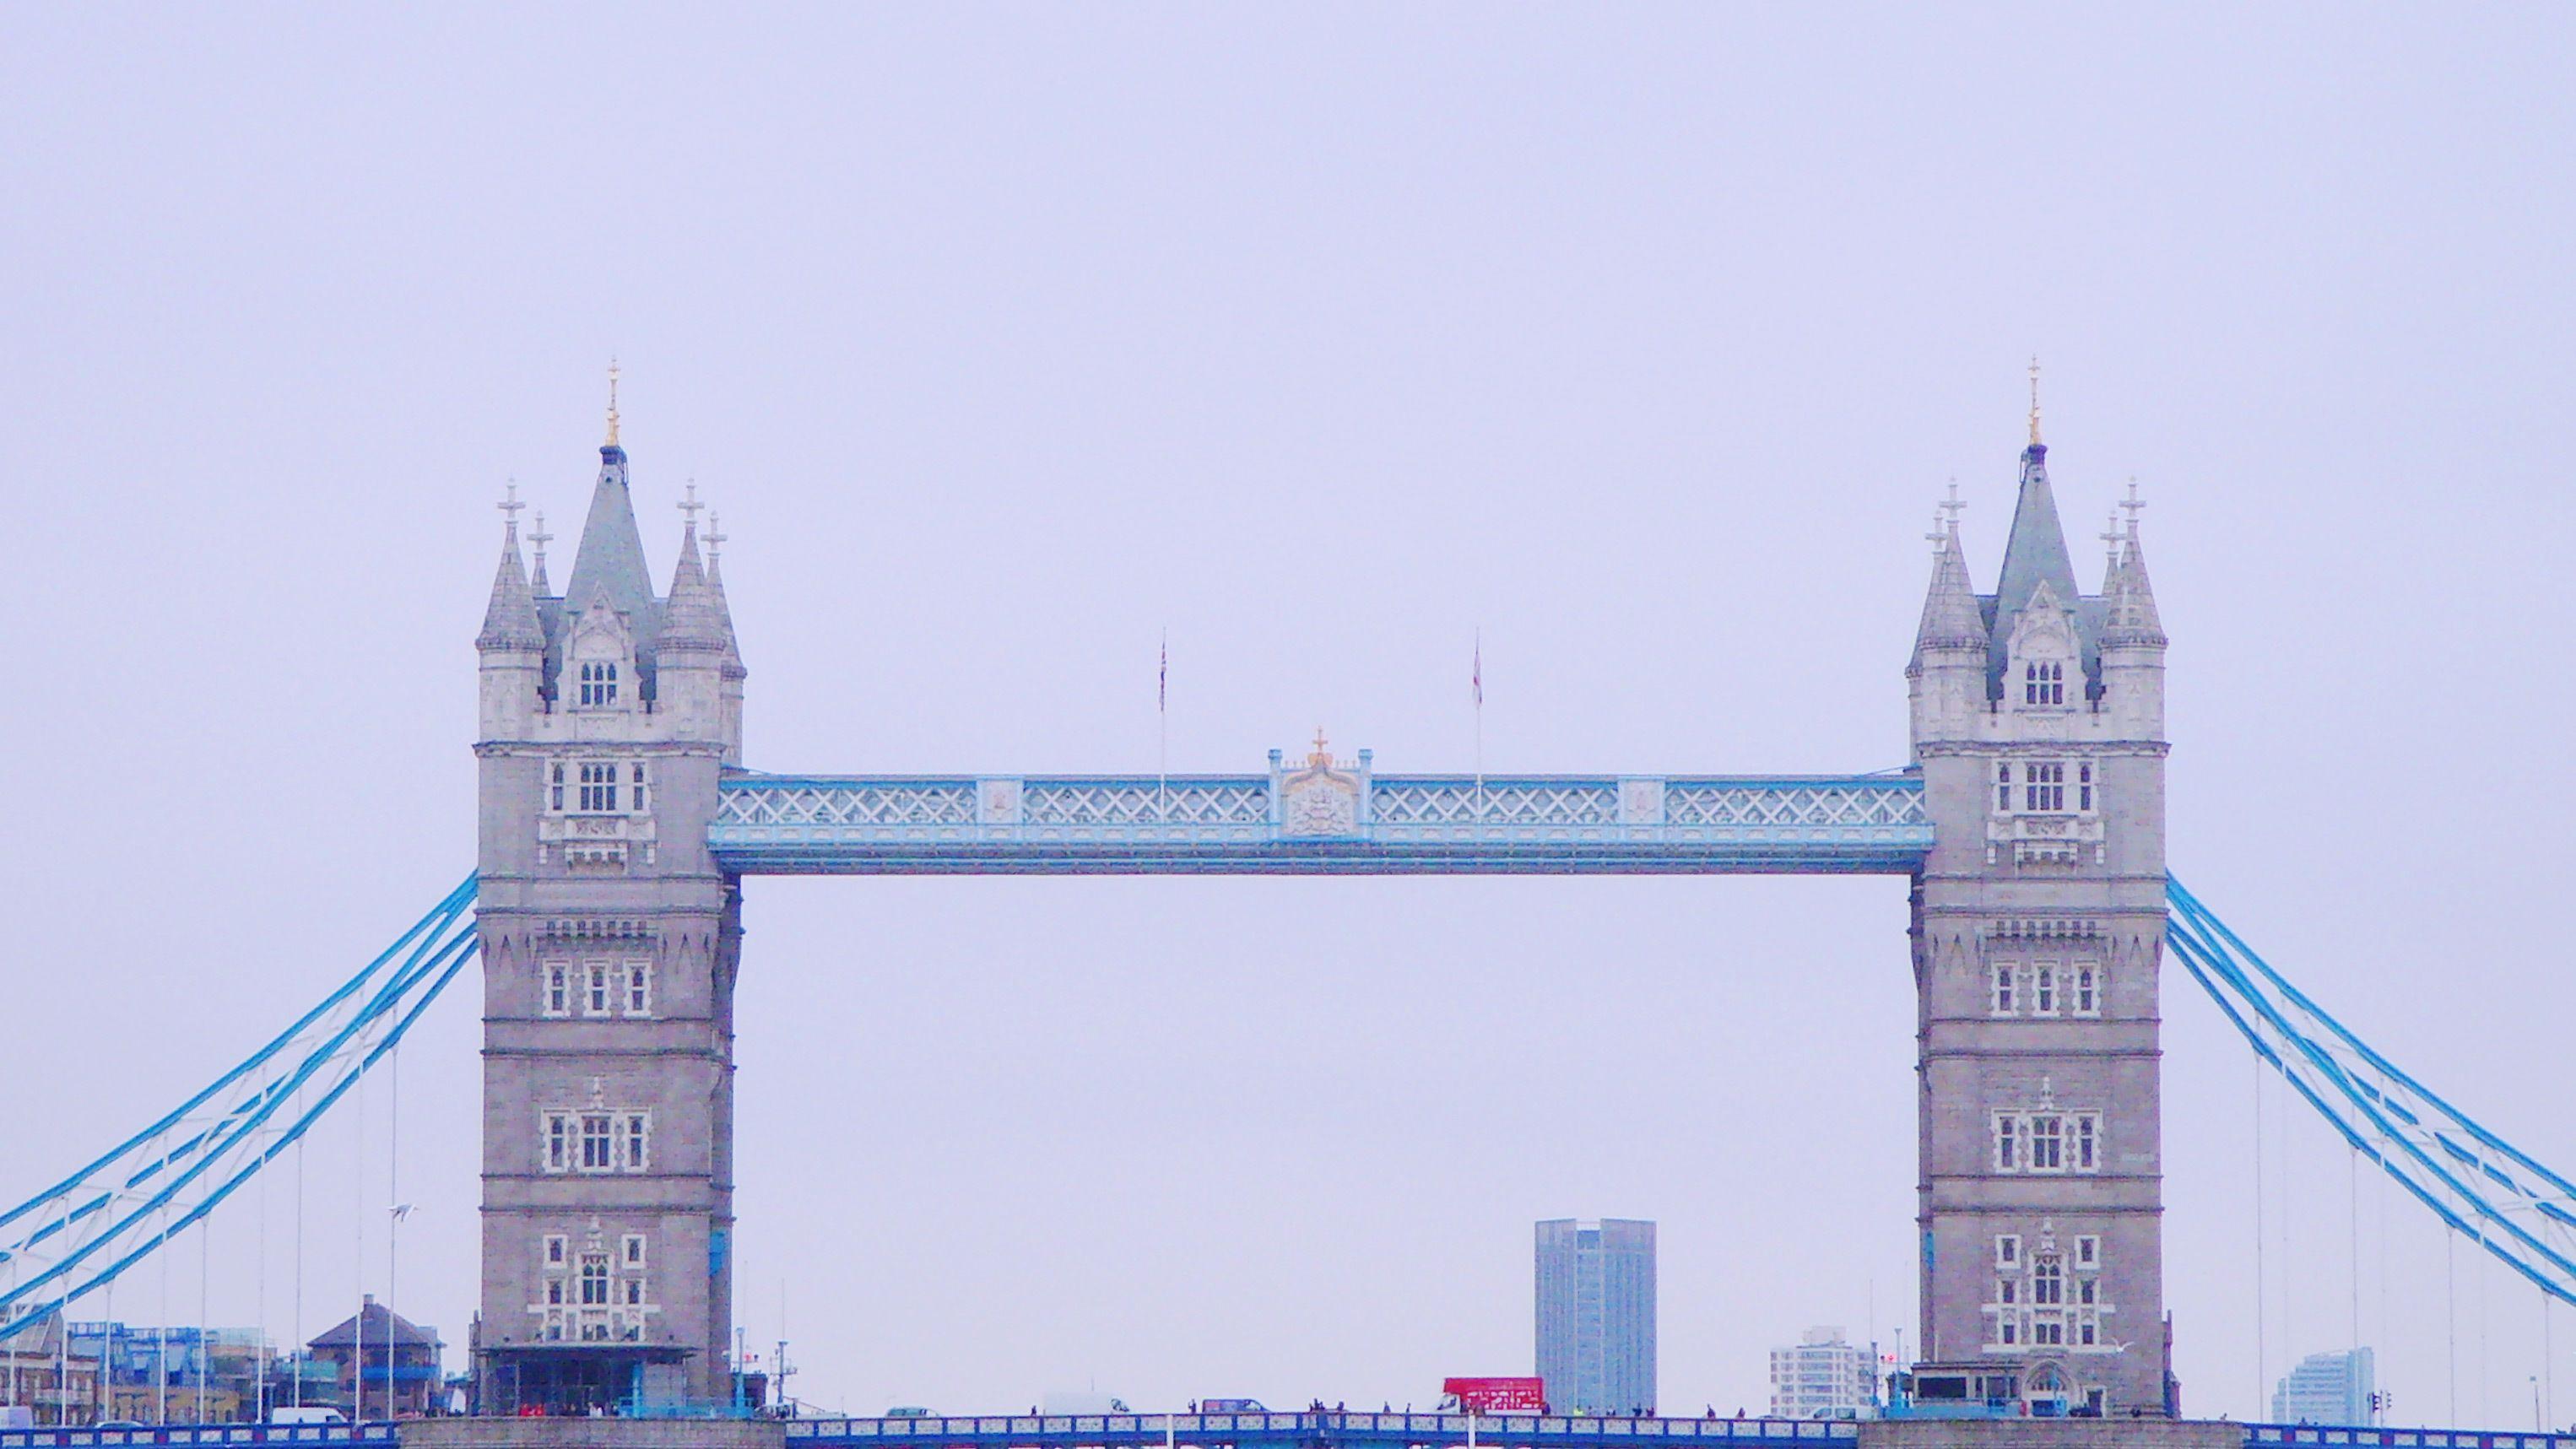 London bridge towers in London